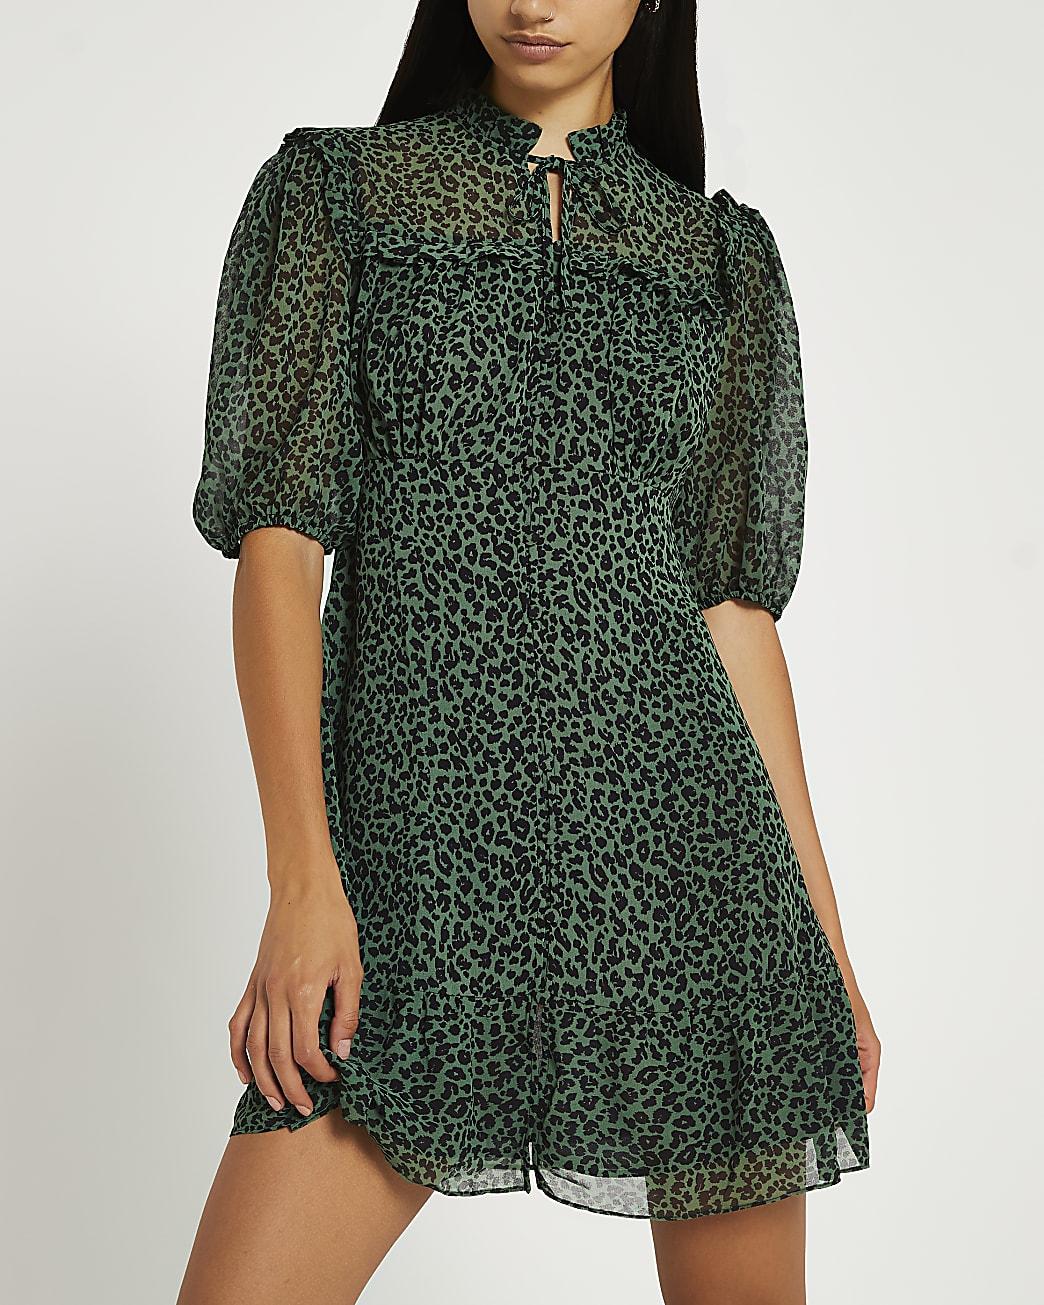 Green animal print tie neck mini dress